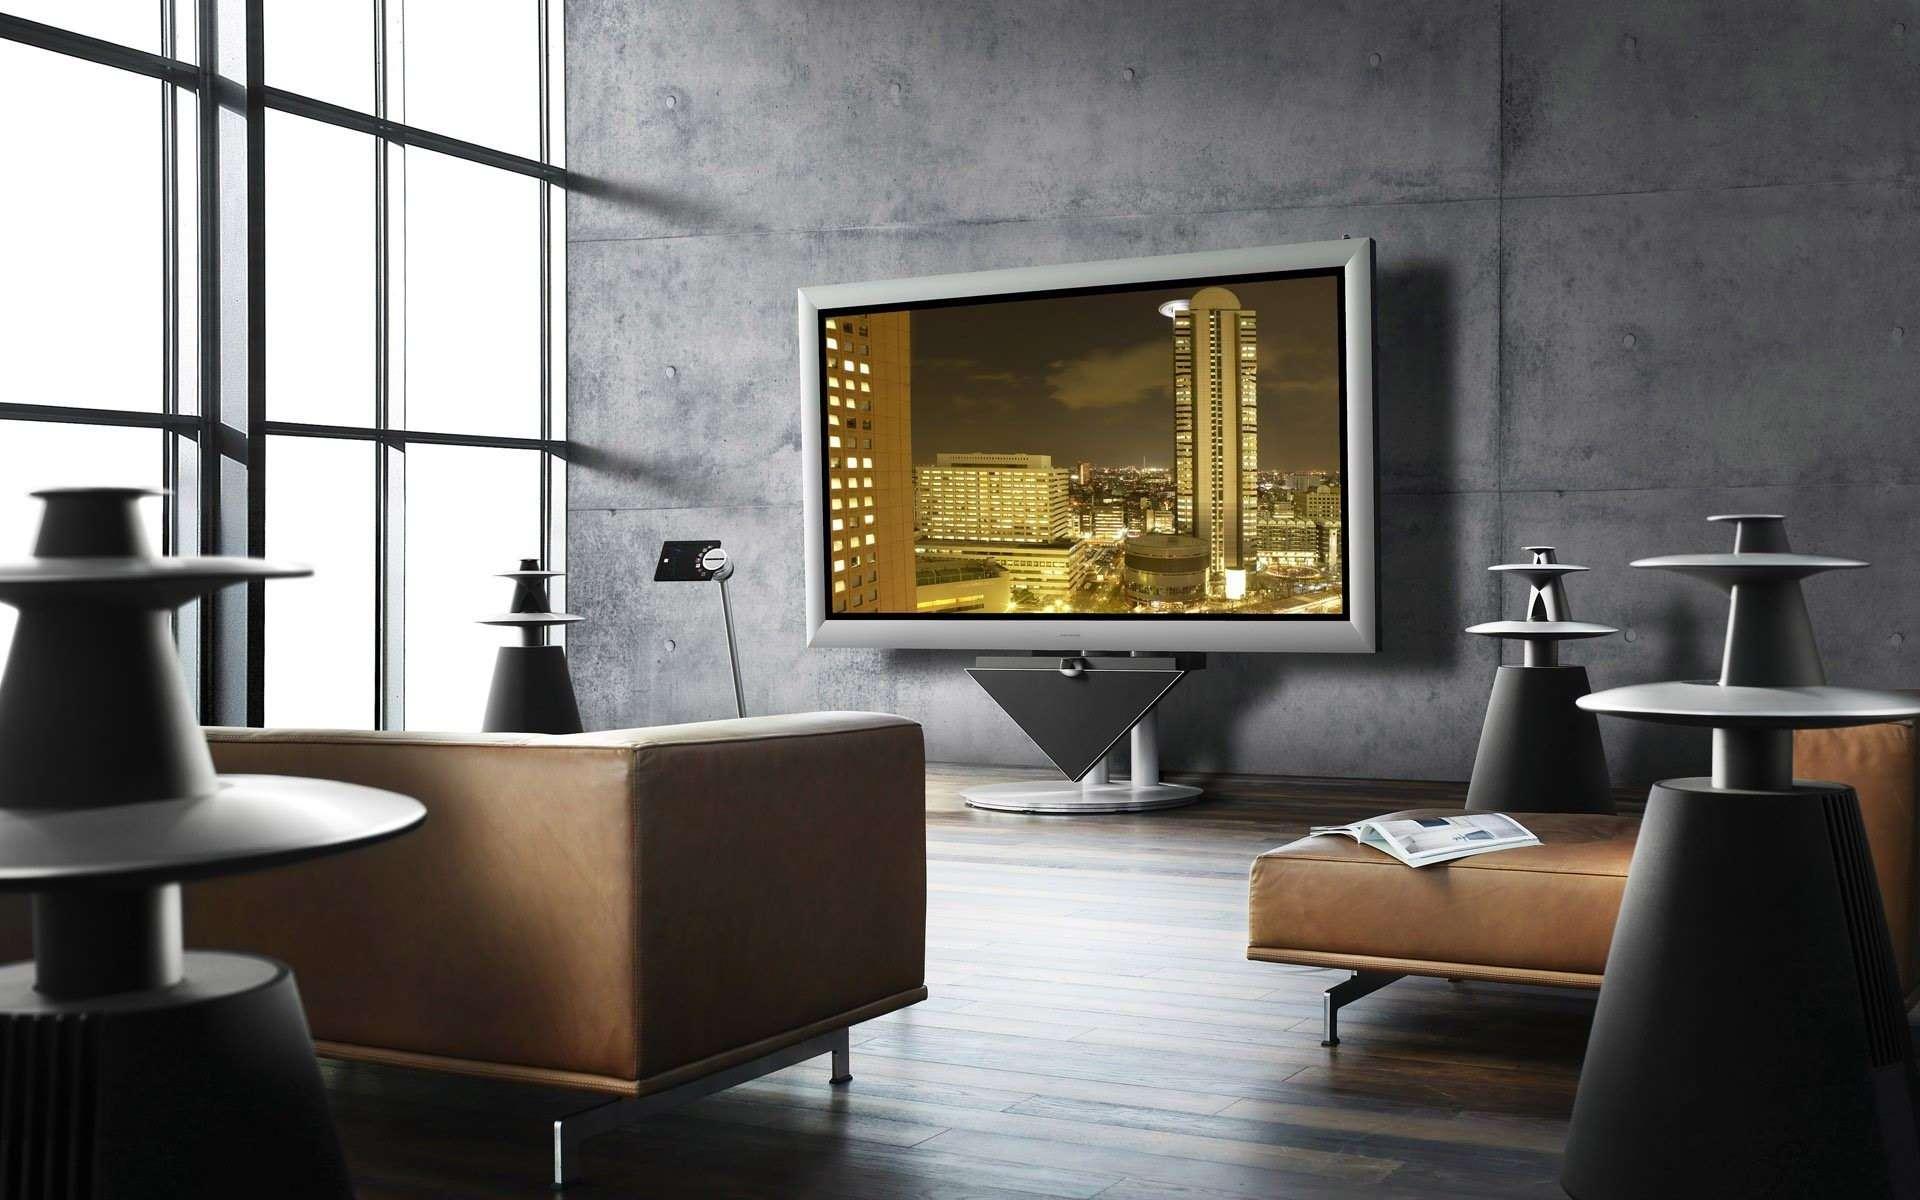 Top 15 TV Anggaran Terbaik: dari murah ke atas. Memilih model terbaik untuk paparan yang menyenangkan (+ Ulasan)